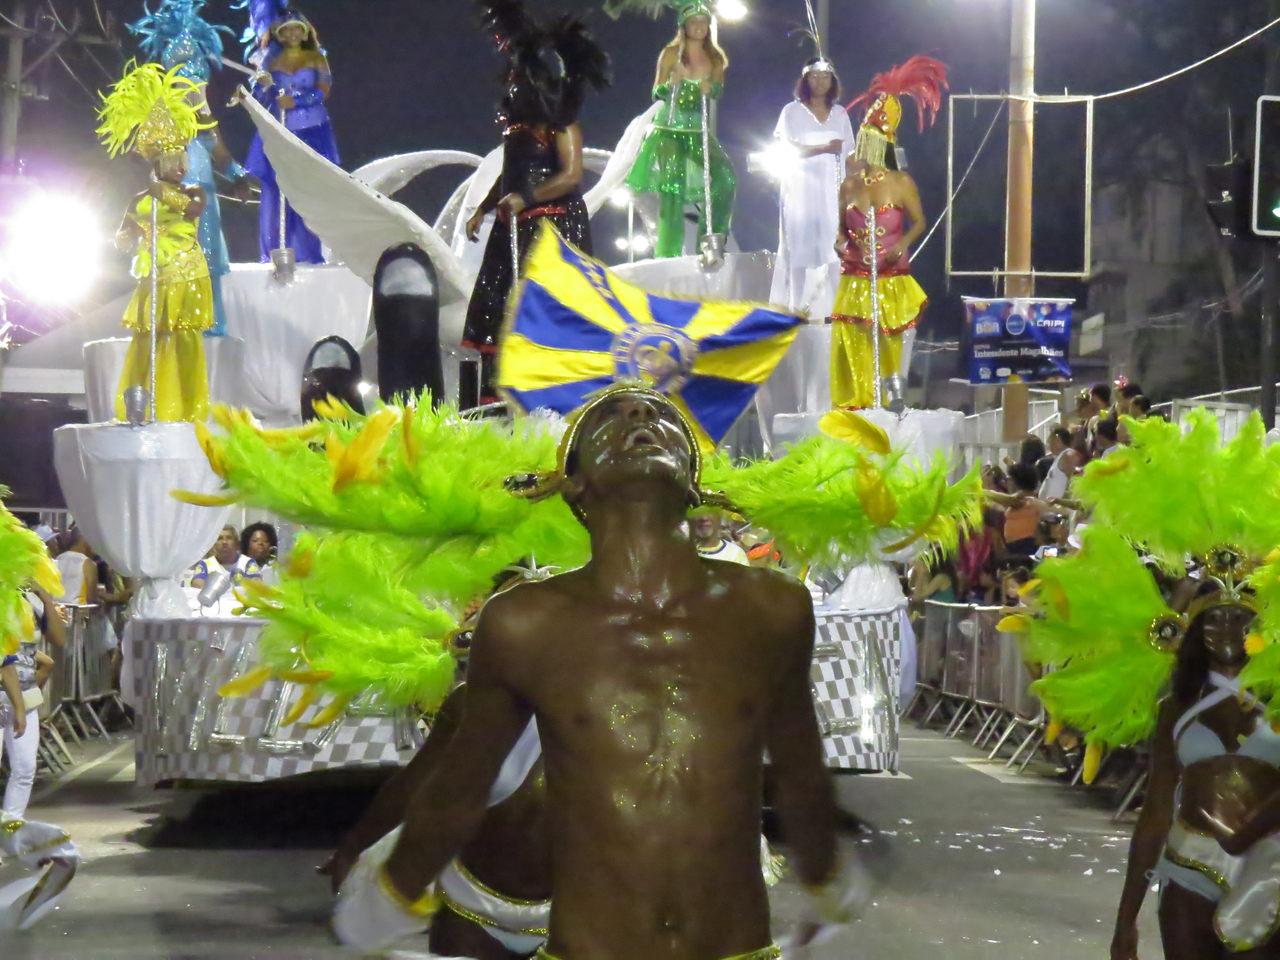 #ManualDoRolé: Longe dos holofotes da Sapucaí, carnaval do povo na Intendente Magalhães